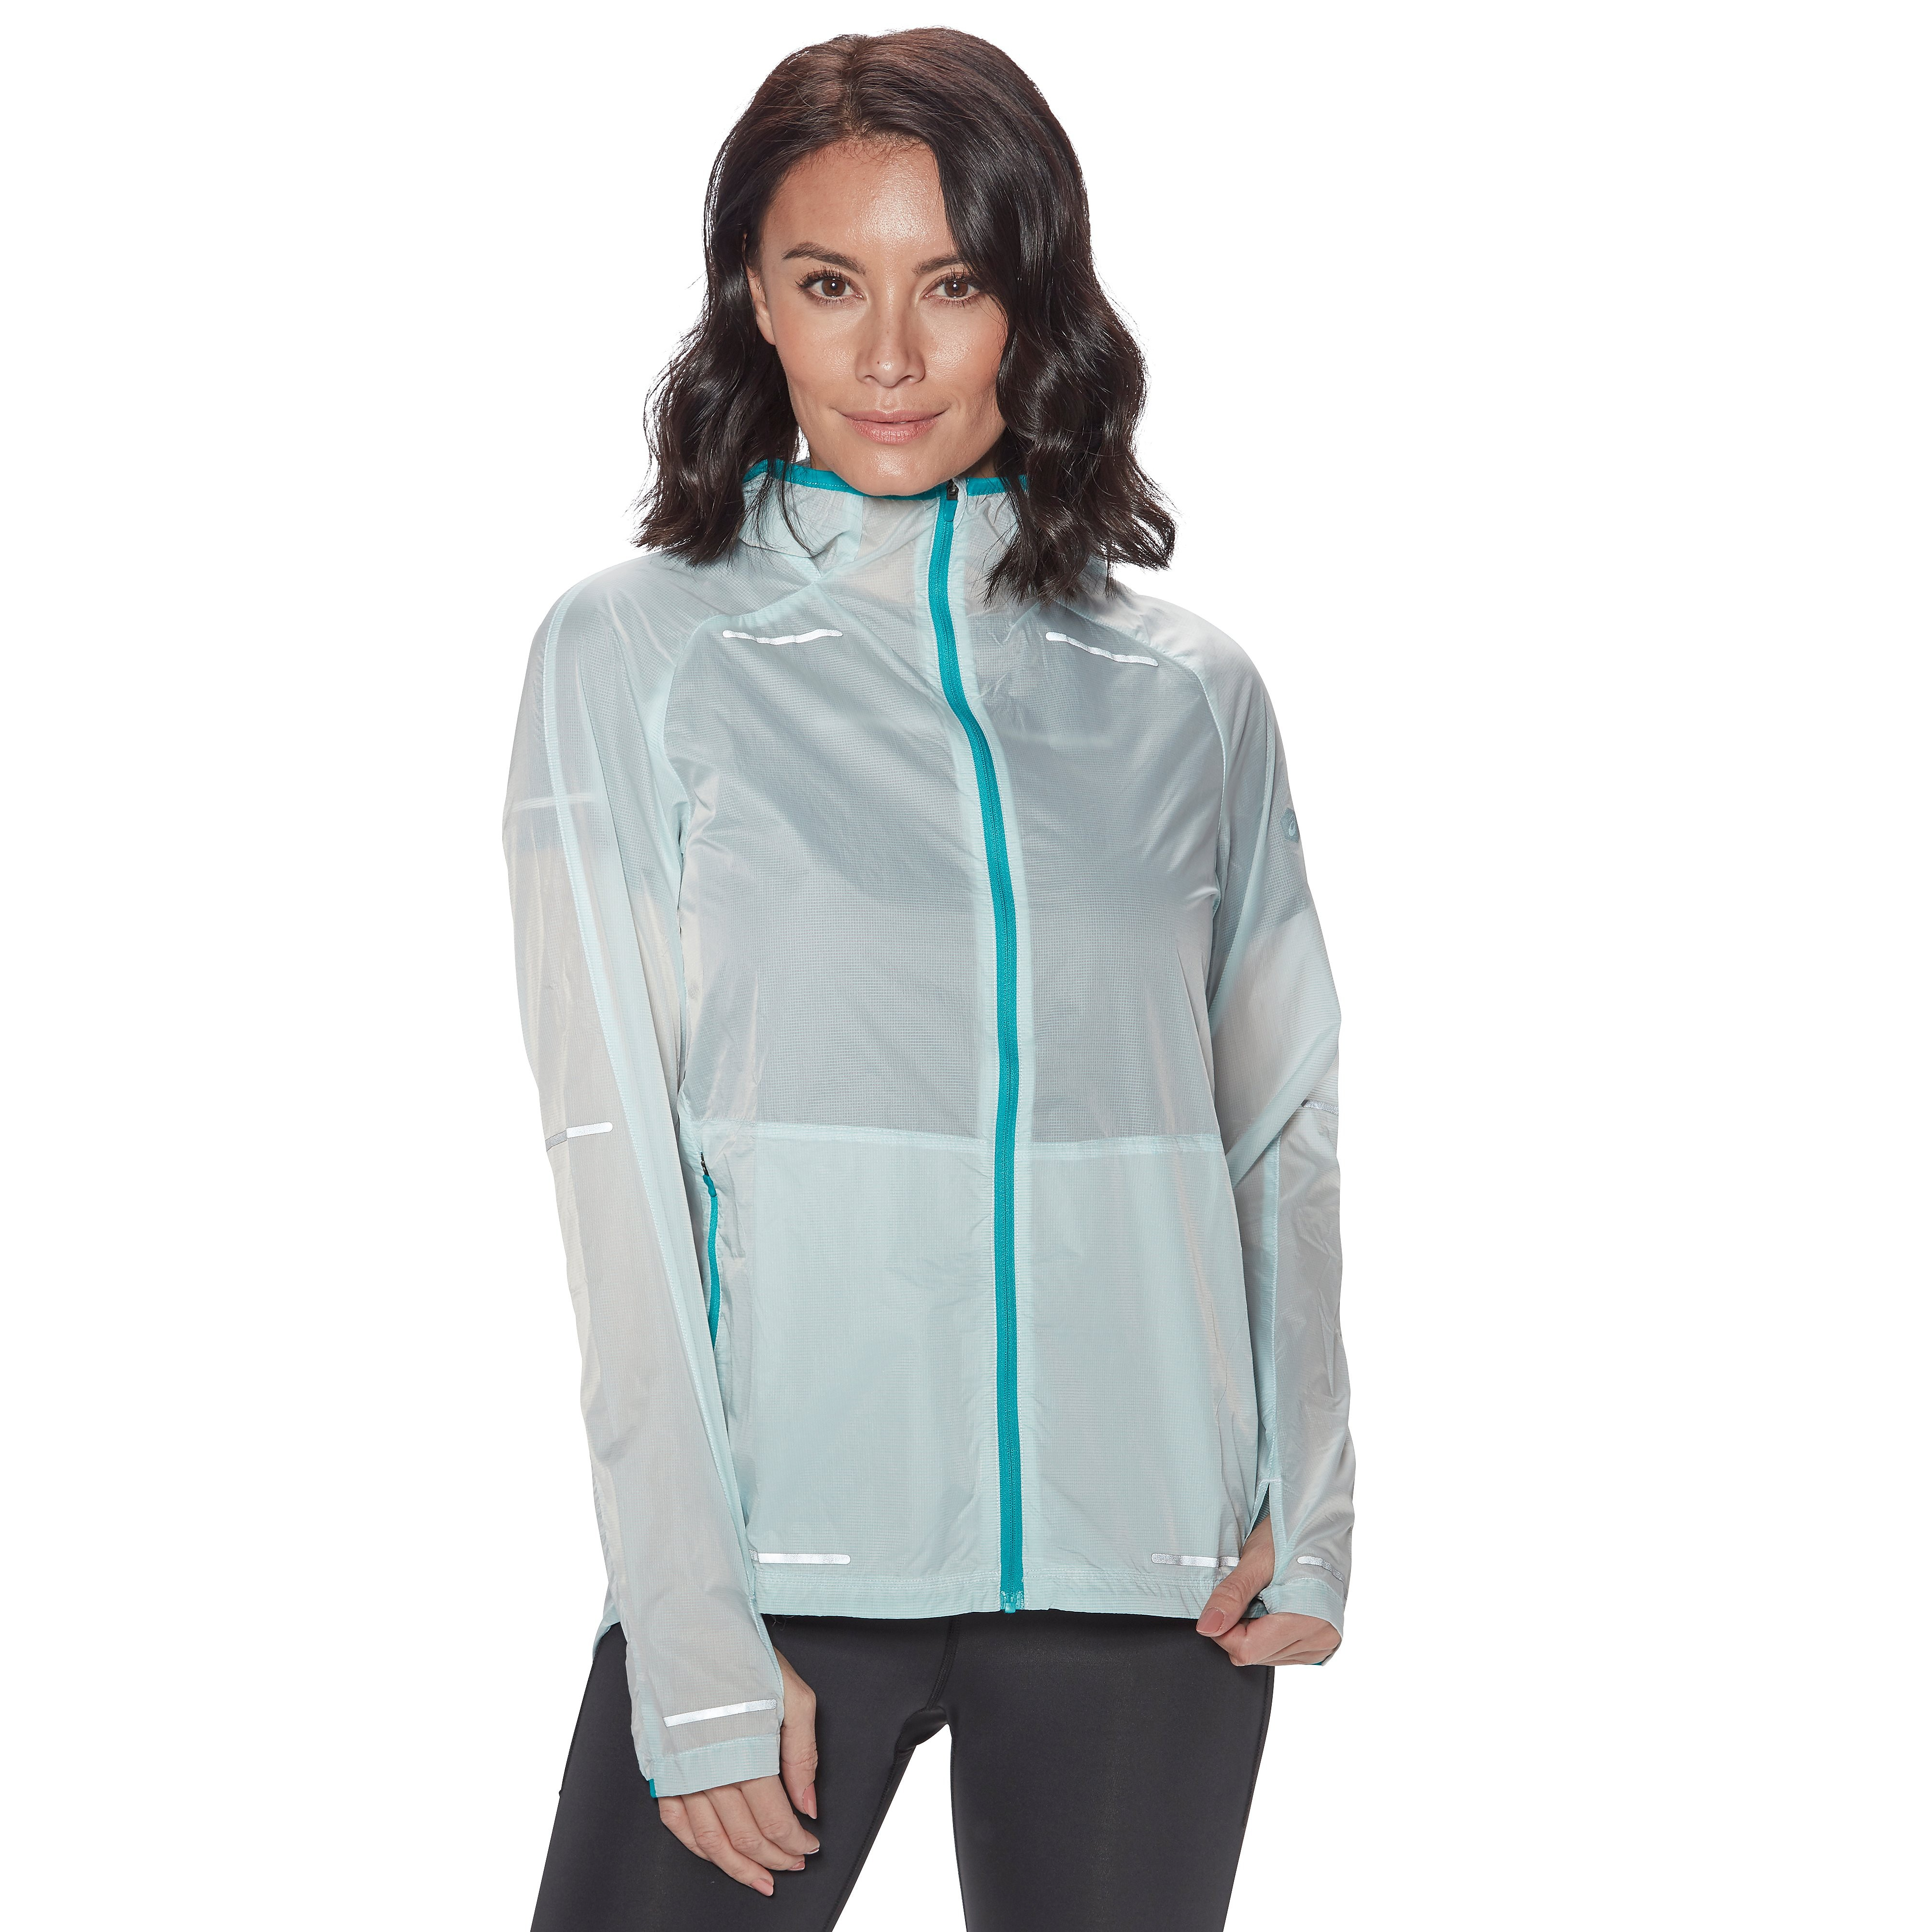 ASICS Lite-Show Women's Running Jacket